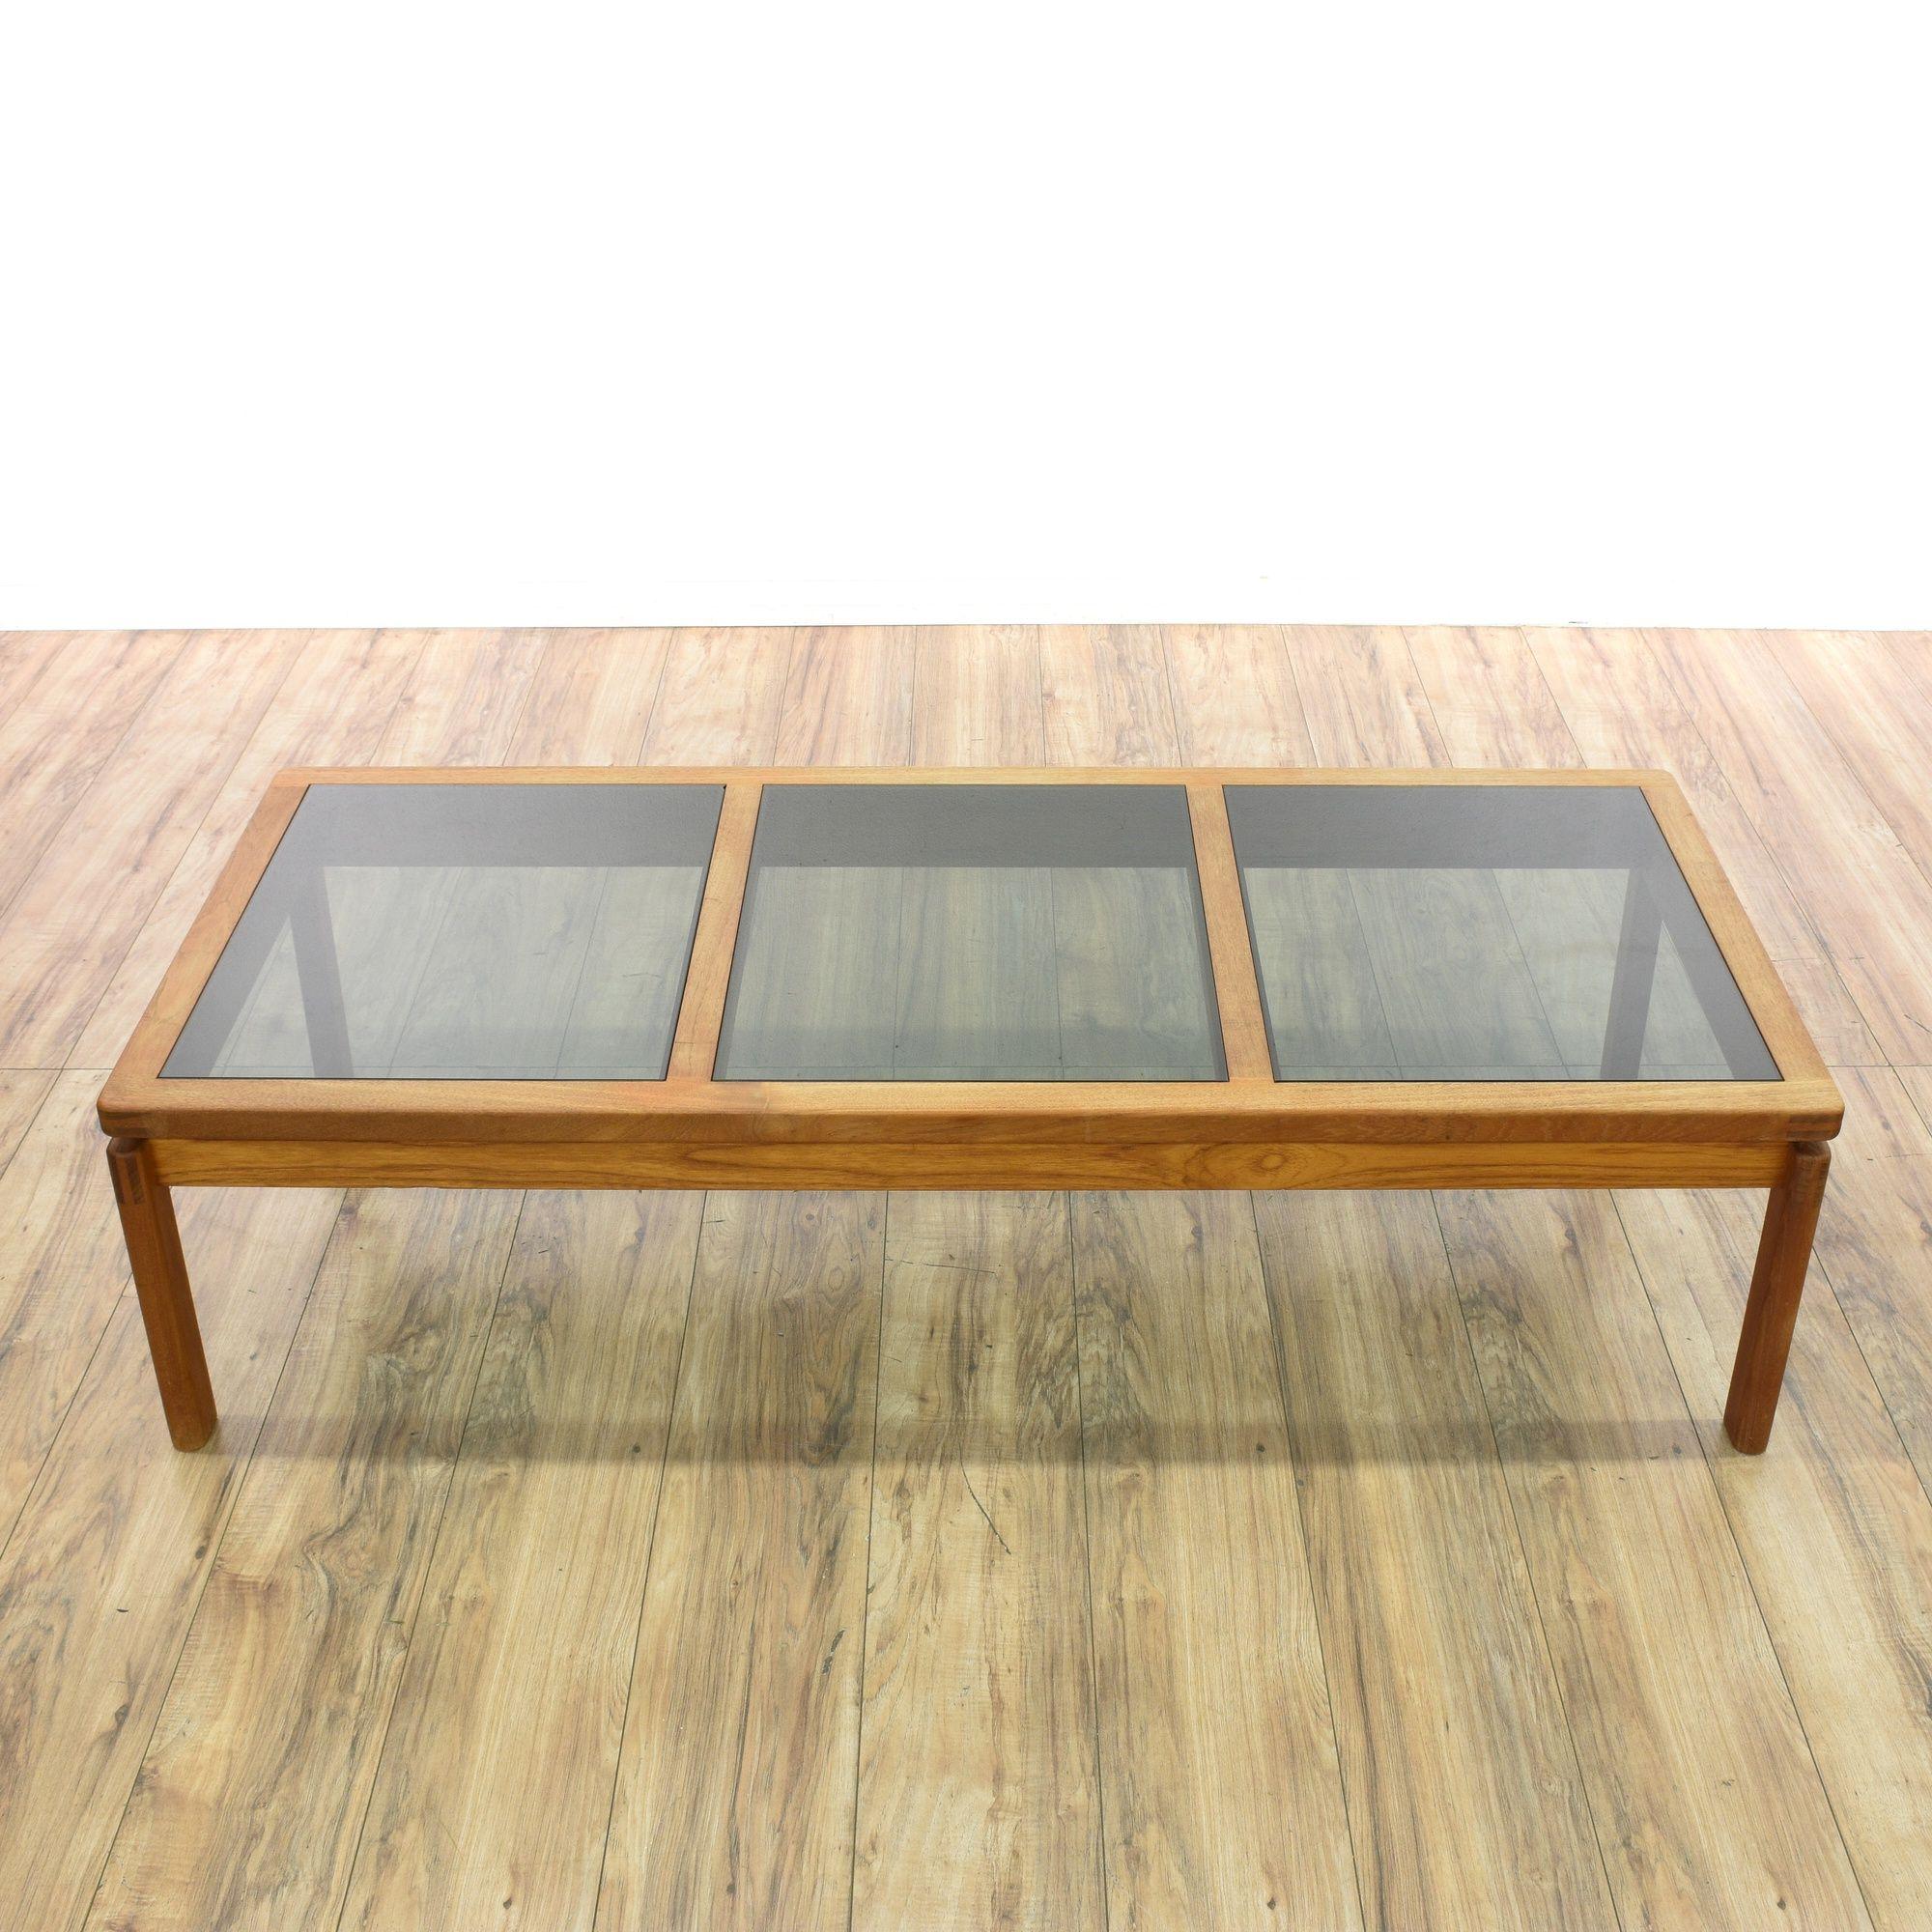 Glass Top Danish Modern Coffee Table | Loveseat Vintage Furniture San Diego